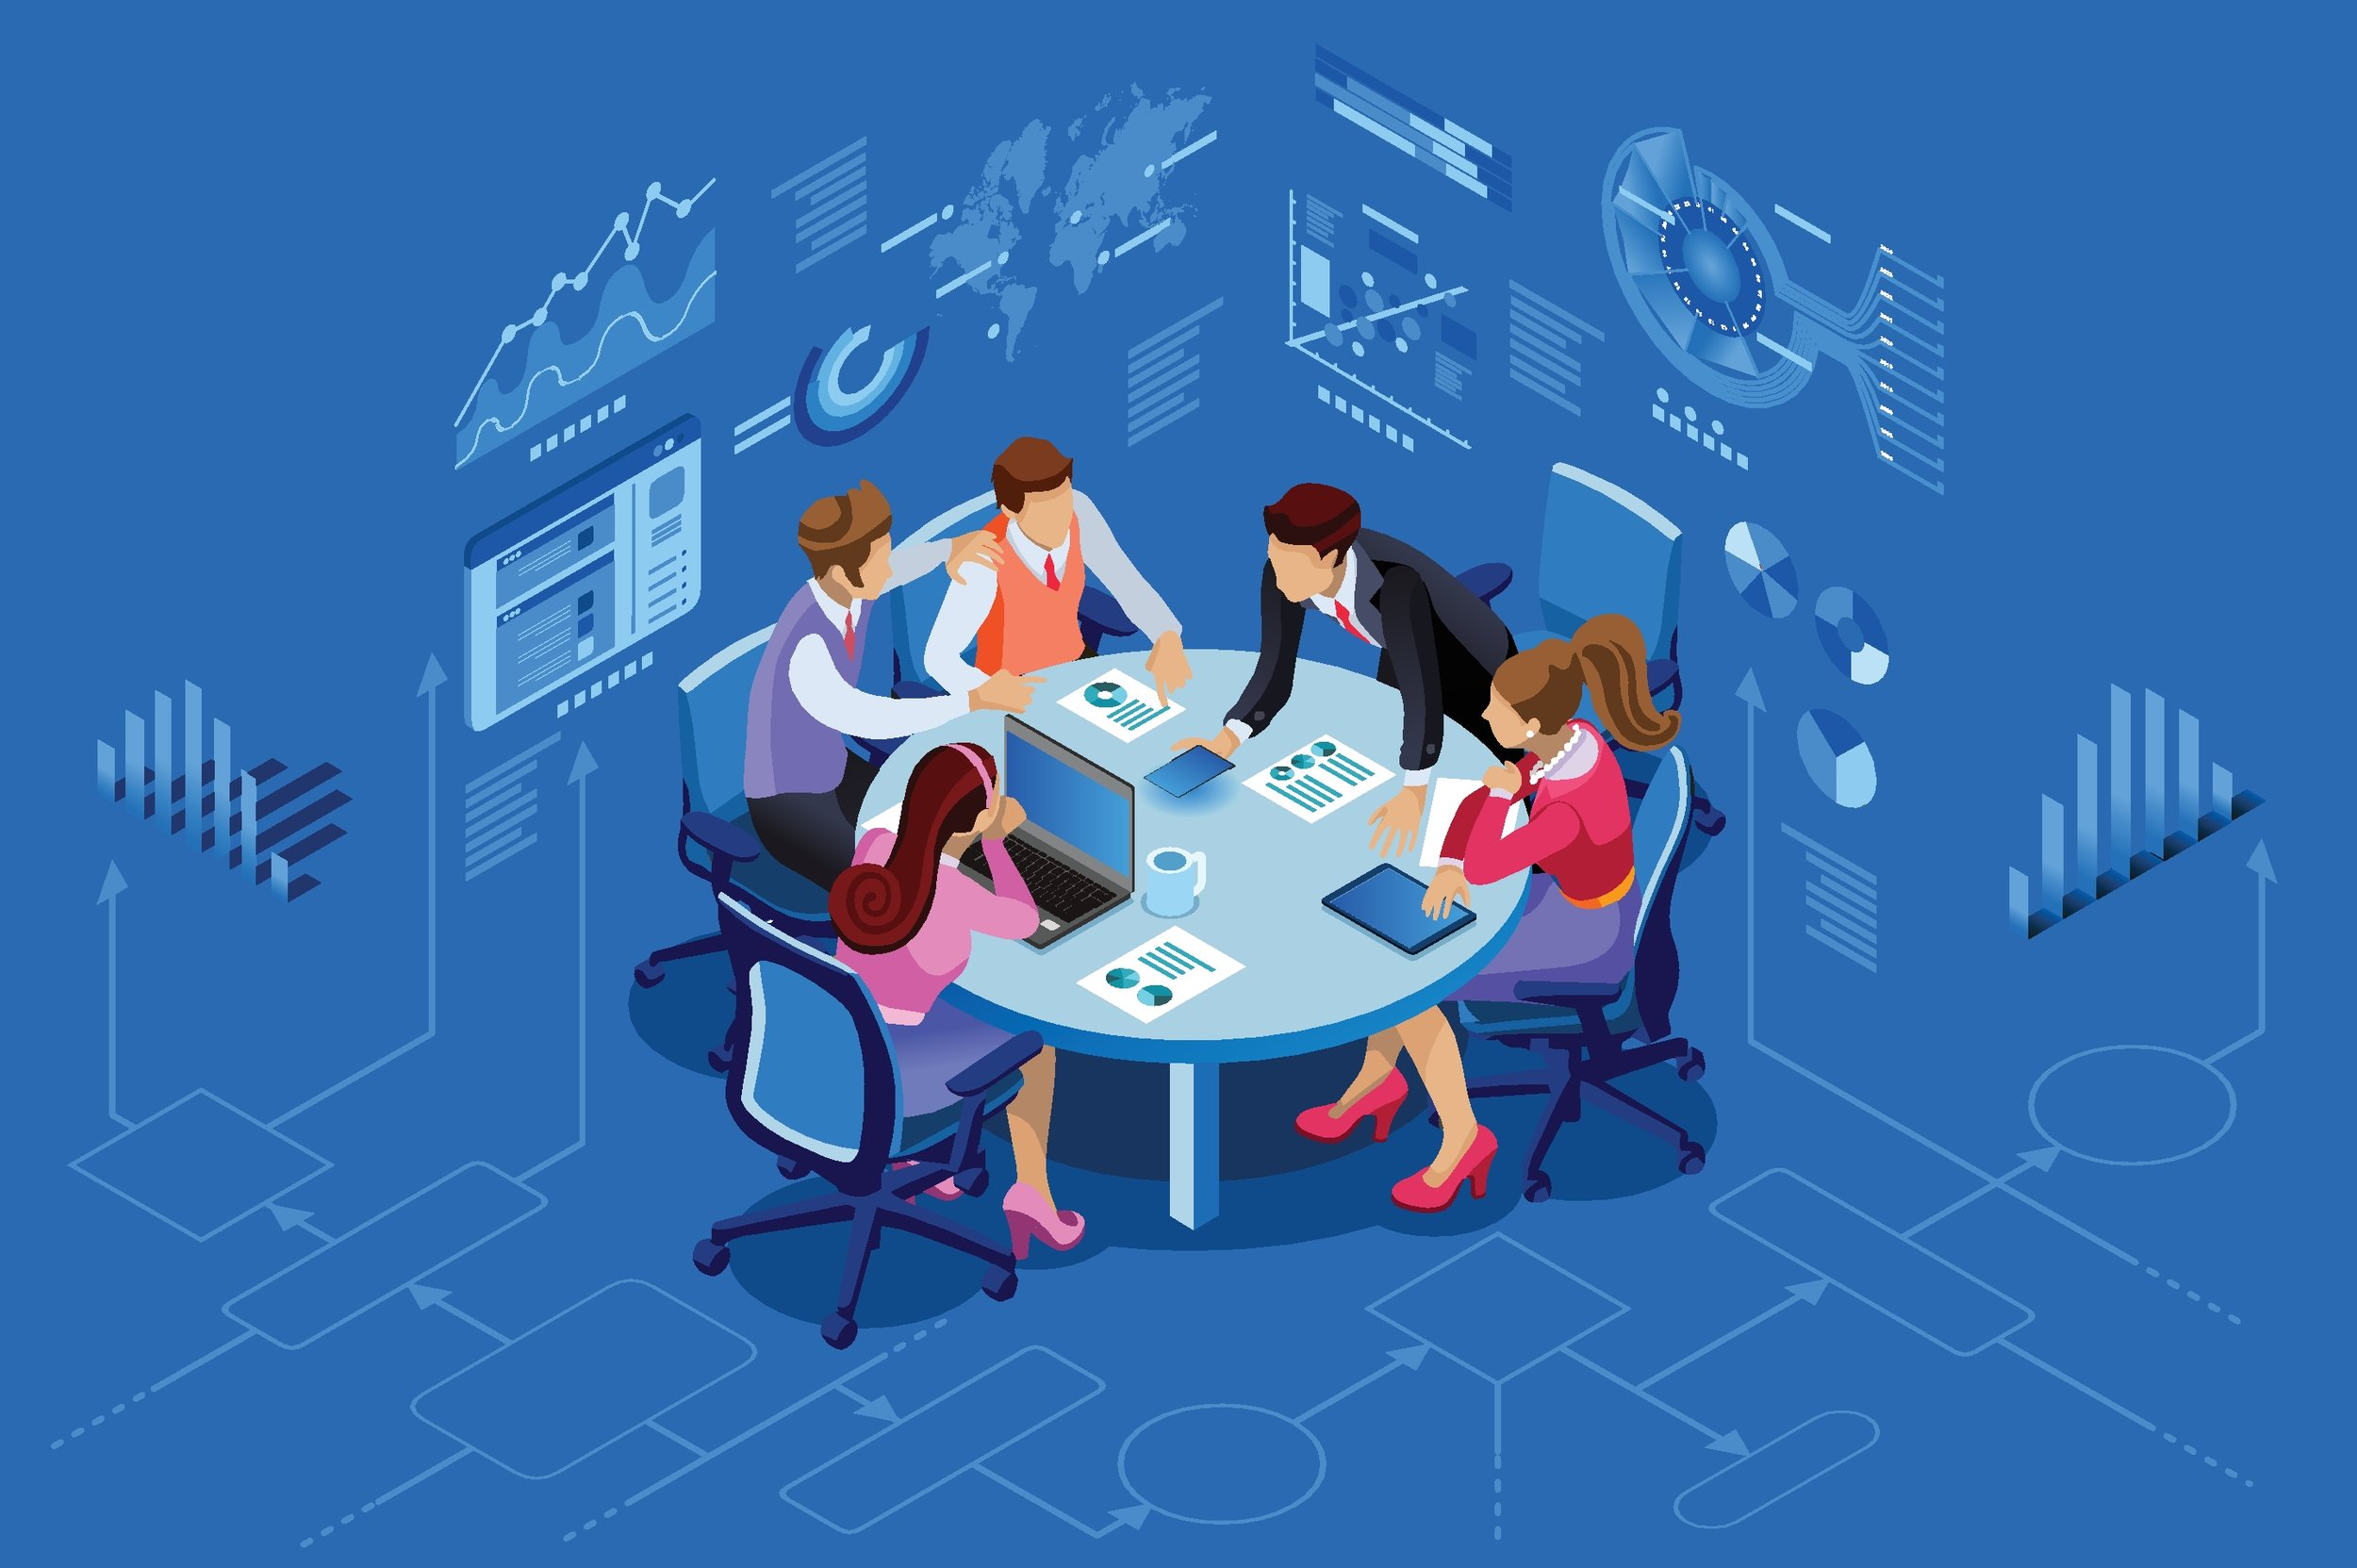 Company team .jpg